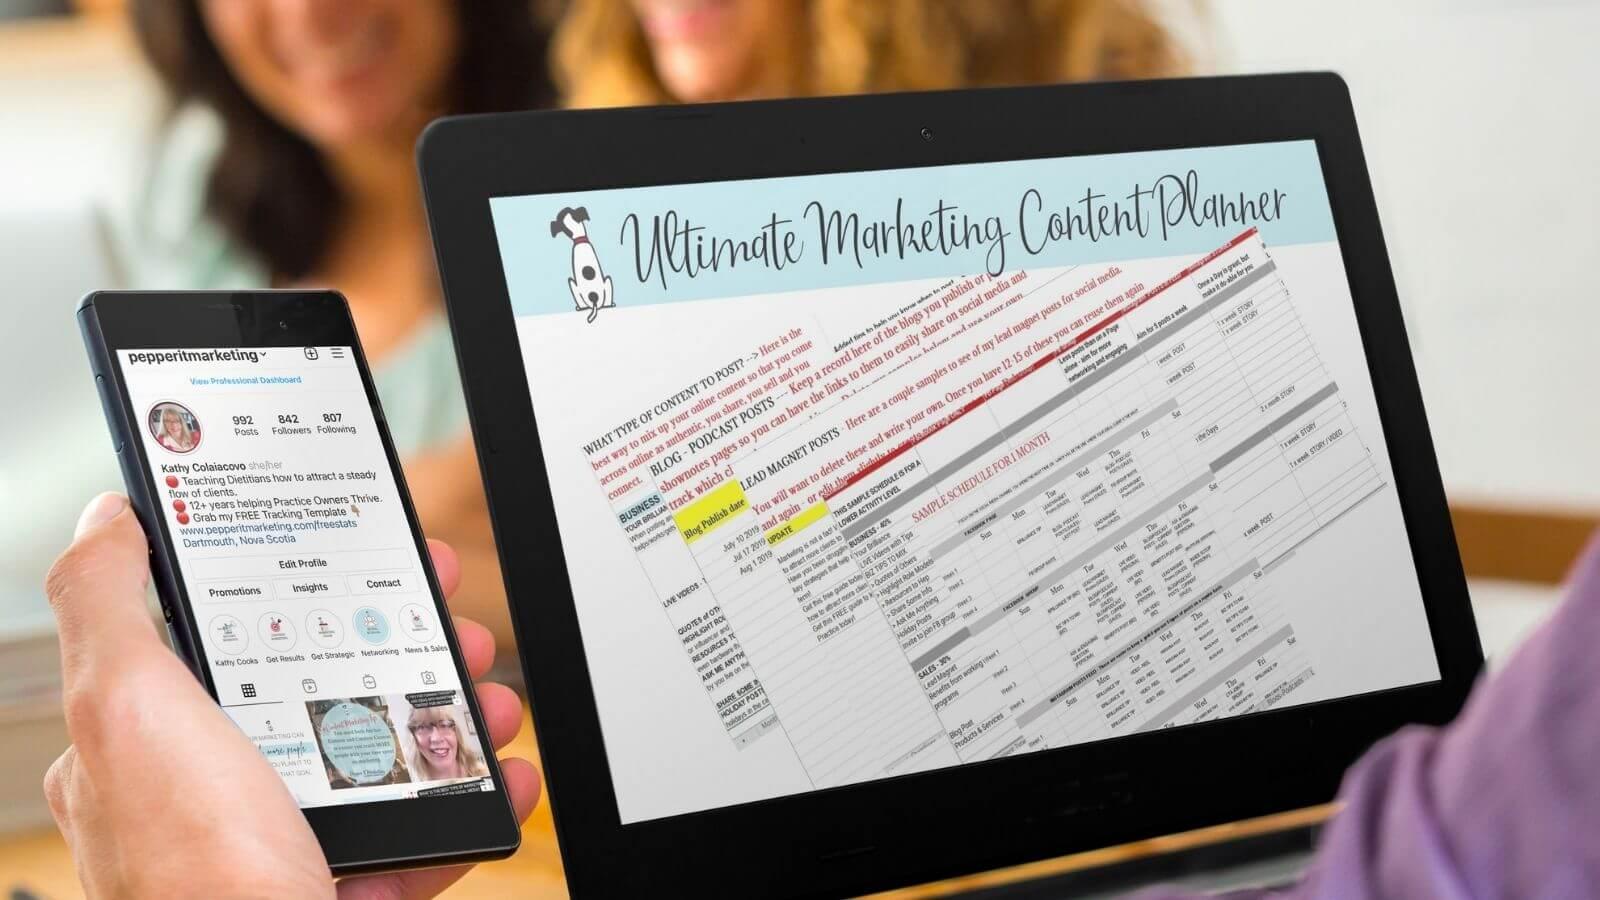 marketing content planner for dietitians